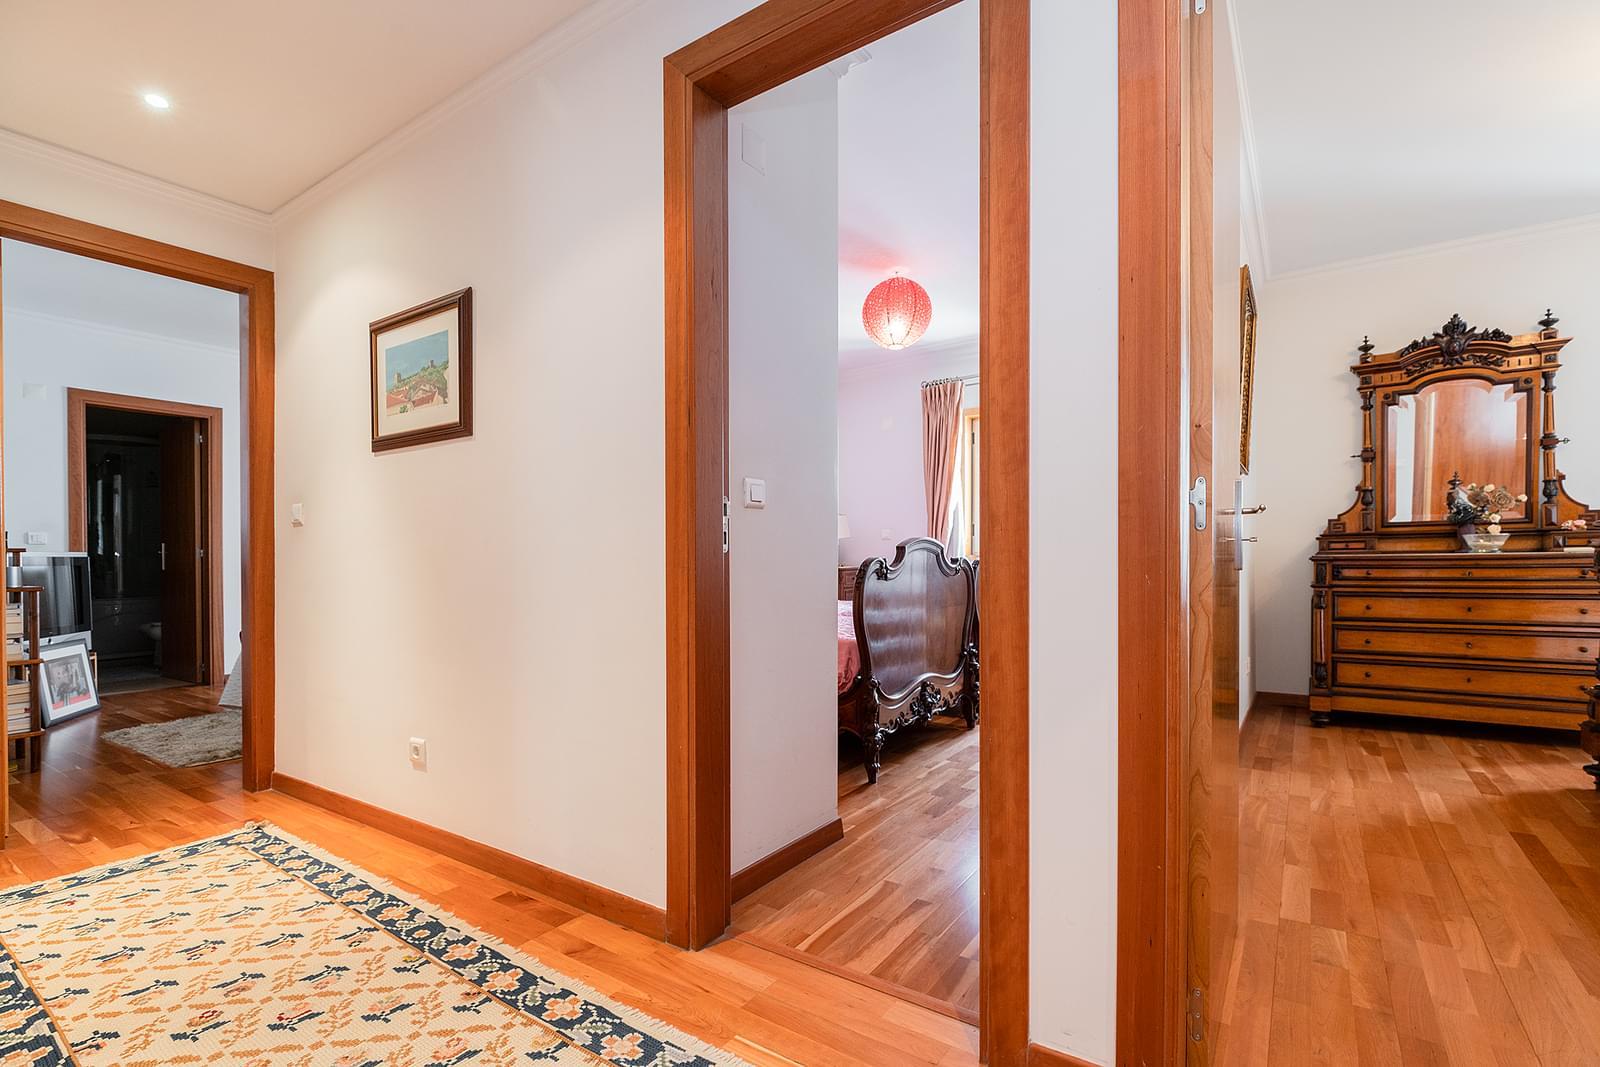 pf18049-apartamento-t3-lisboa-ce755099-75ef-4dcf-b43d-bf532e40aa3e